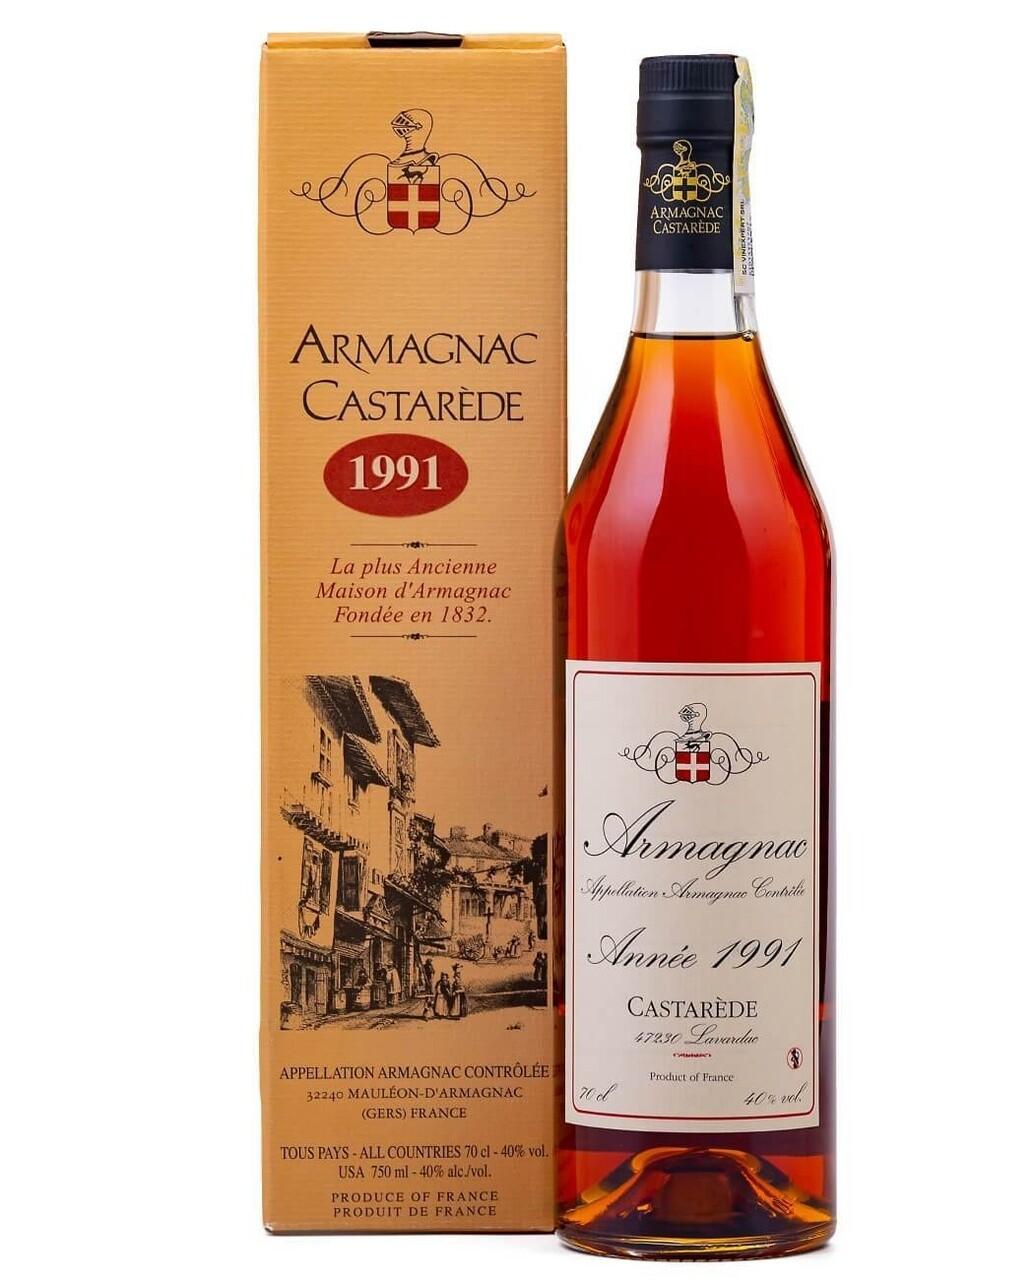 Armagnac Castarede 1991